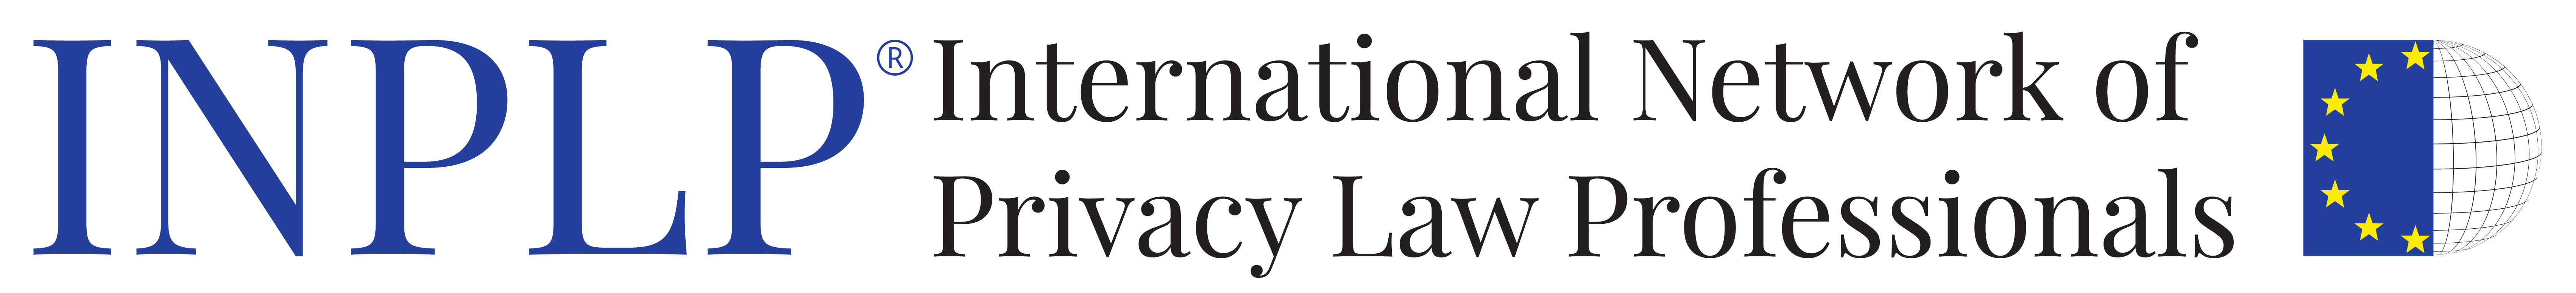 GDPR Fines - Logo